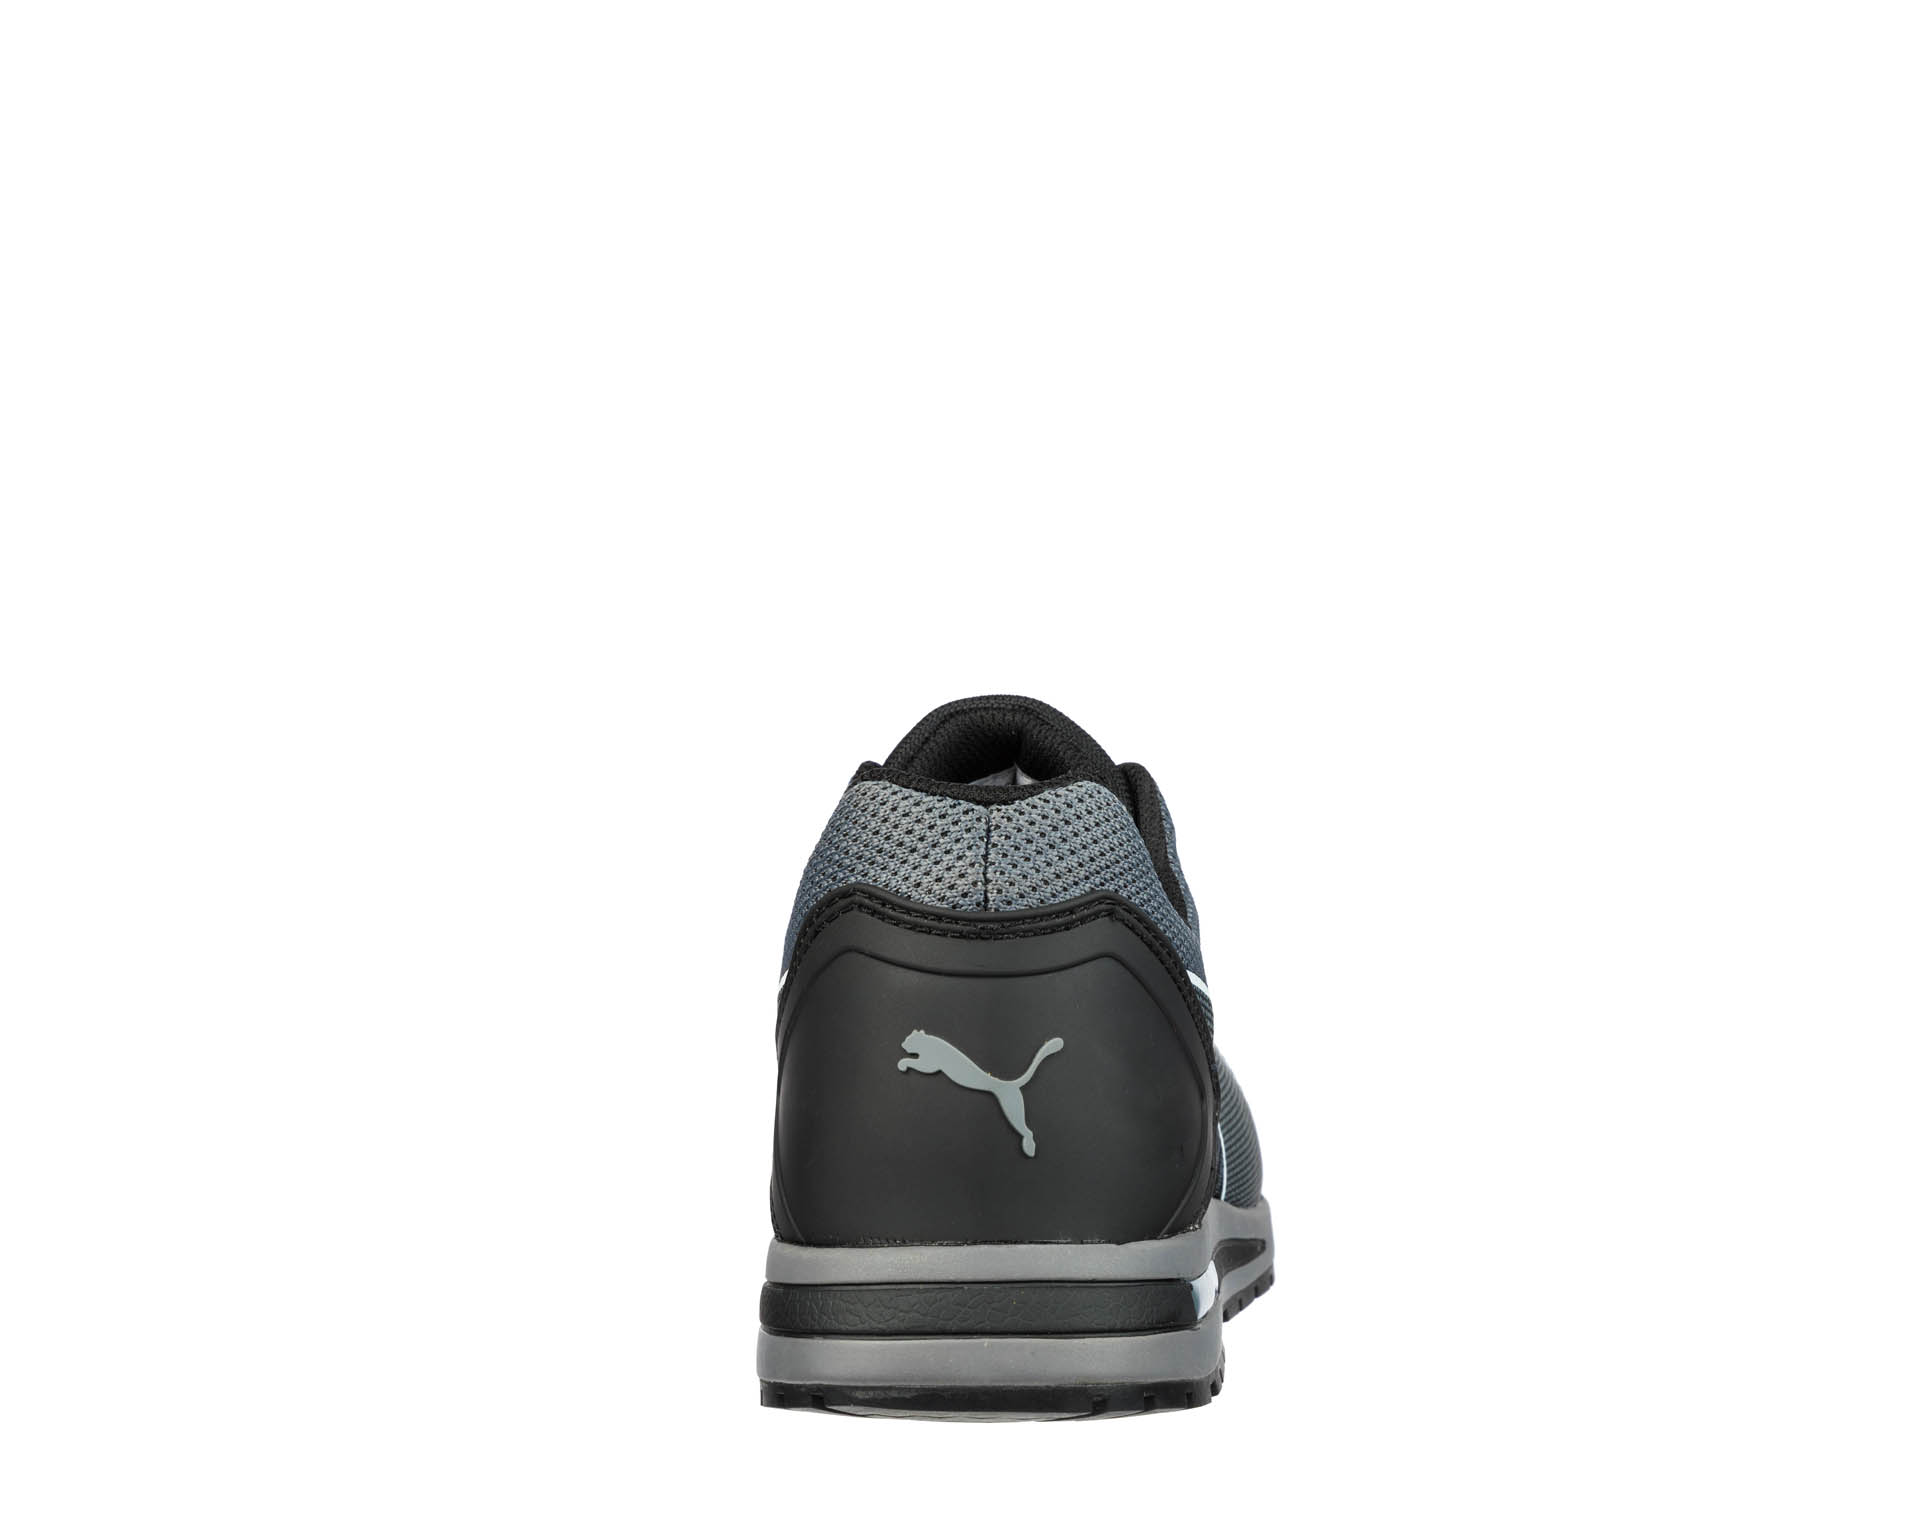 Puma Elevate Knit Black Low 643160 S1P ESD Sicherheitsschuhe 42 SchwarzGrau